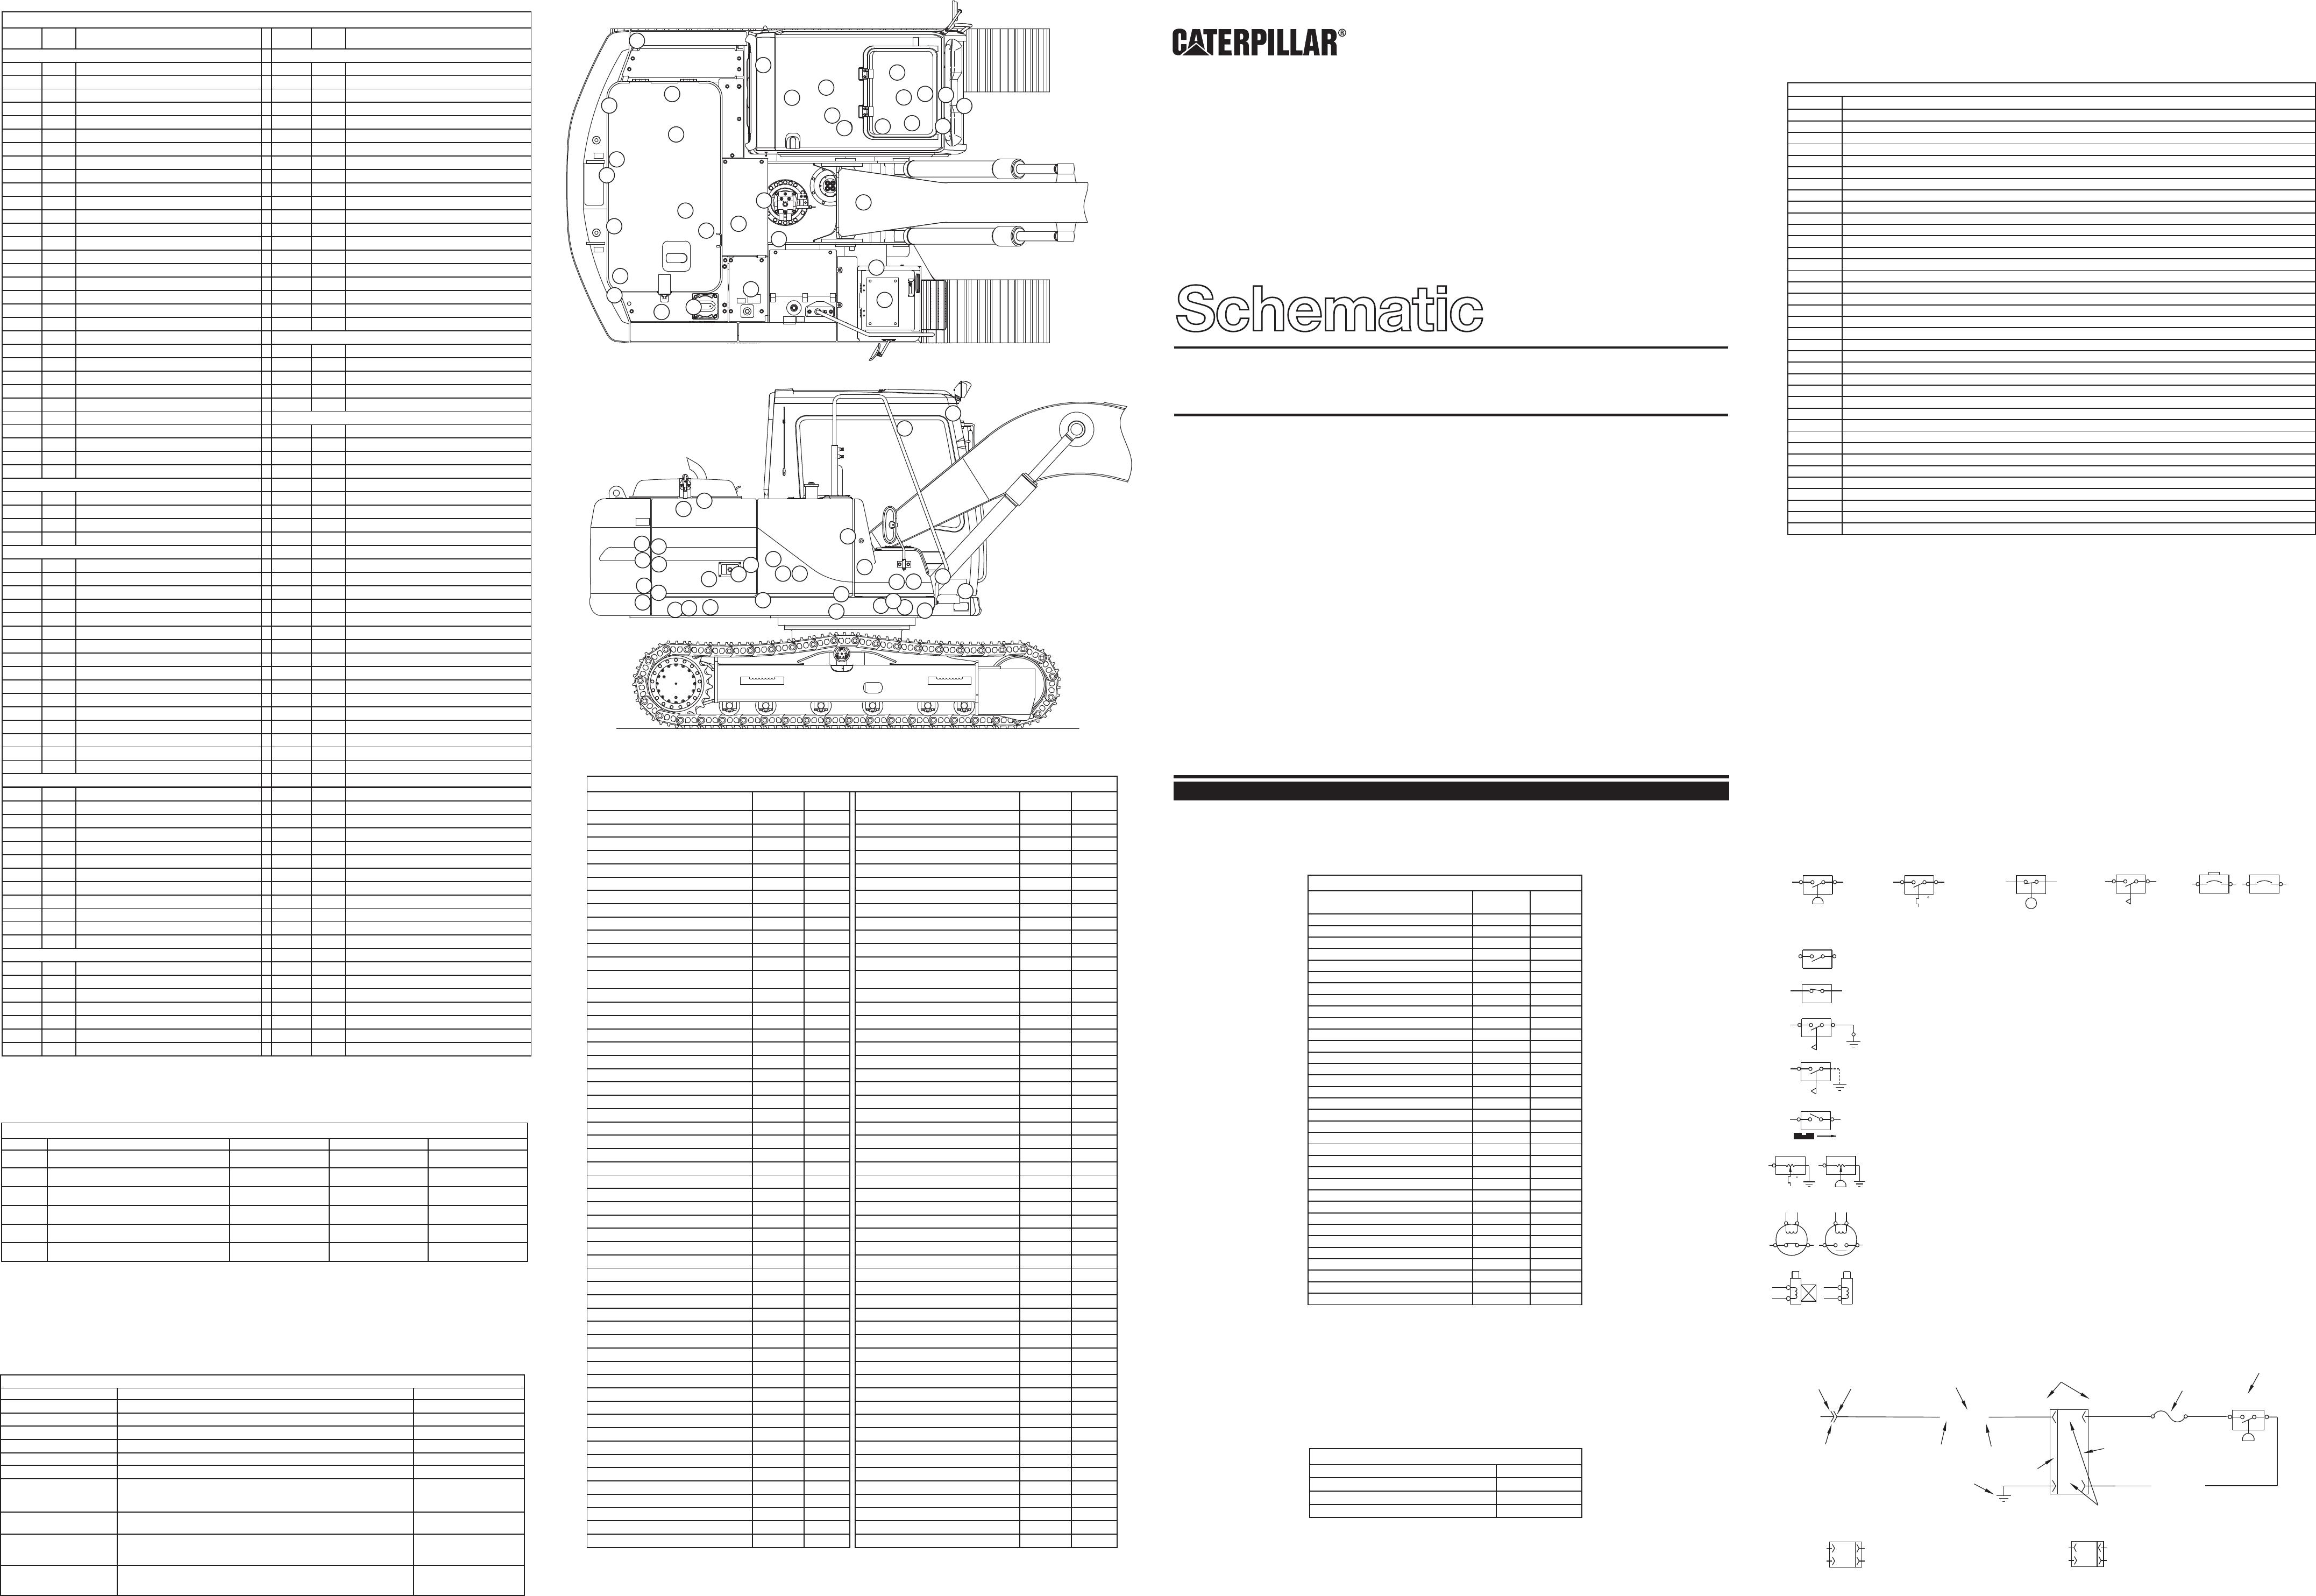 [DIAGRAM_4PO]  312B,312B L EXCAVATOR ELECTRICAL SCHEMATIC USED IN SERVICE MANUAL RENR1100  GRENOBLE | CAT Machines Electrical Schematic | Caterpillar Solenoid Wiring Diagram |  | CAT Machines Electrical Schematic